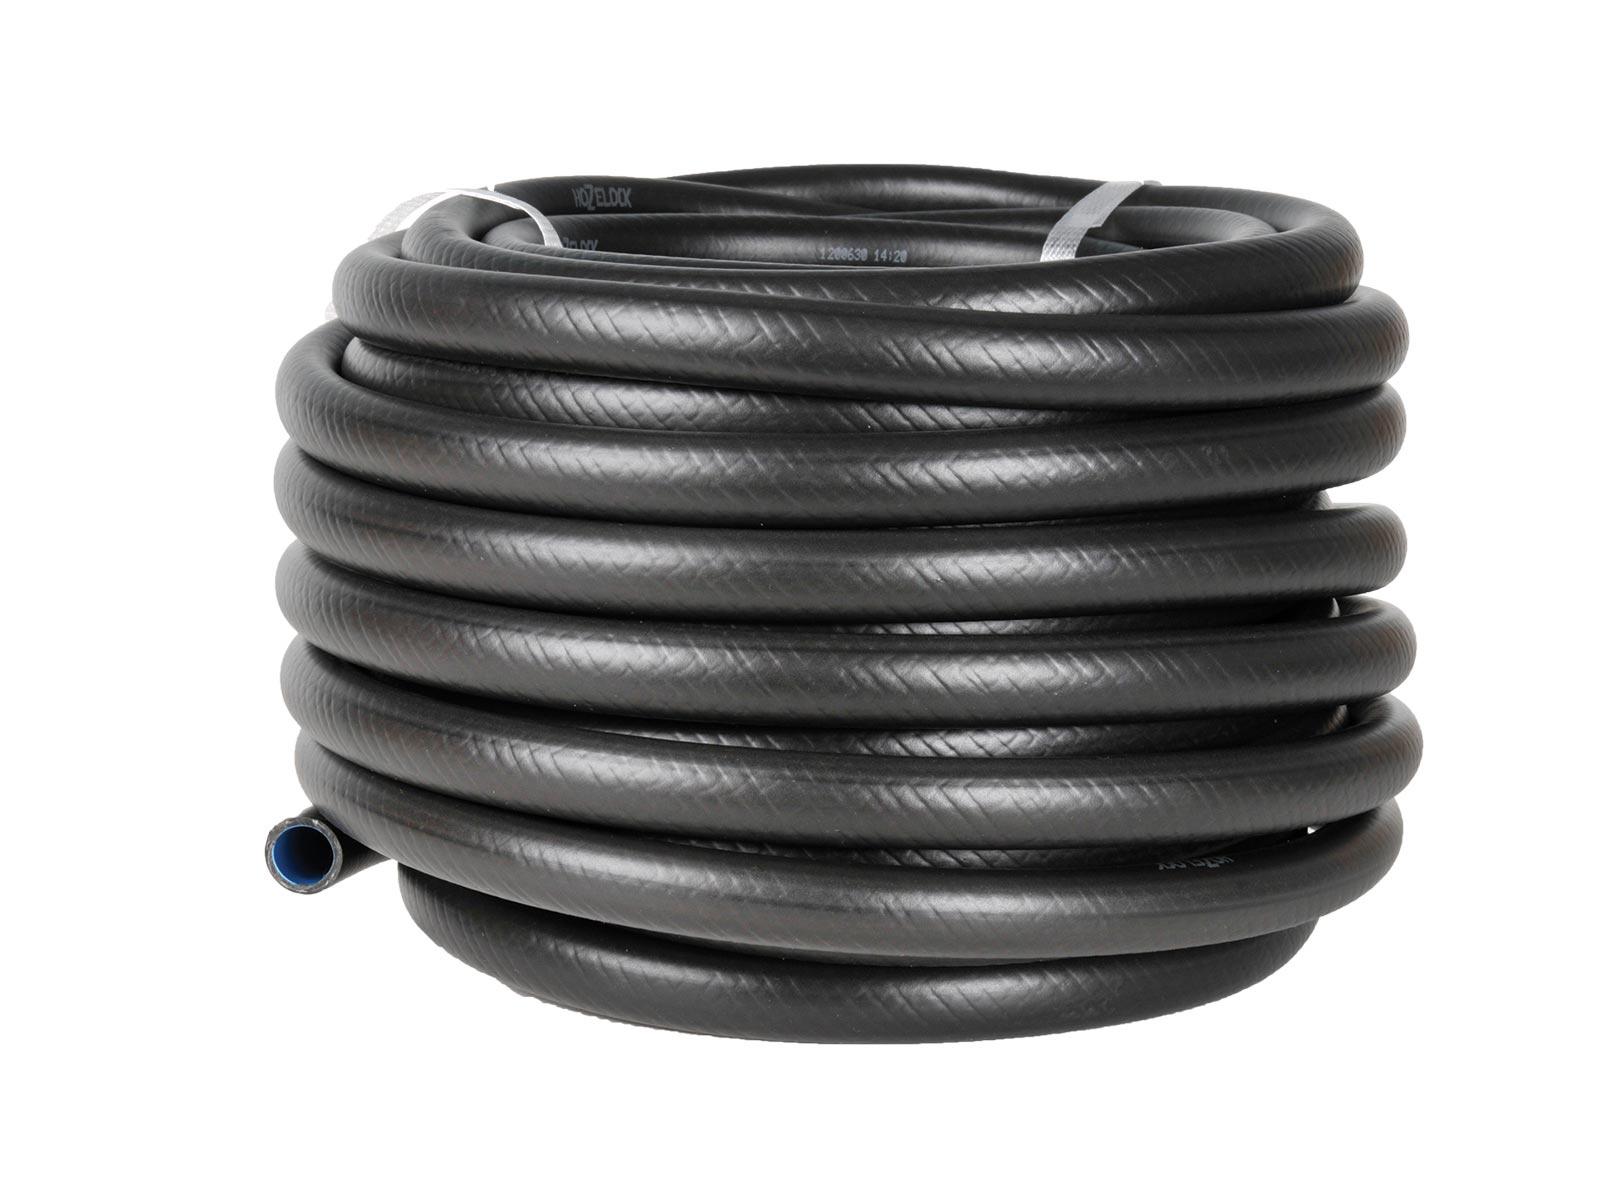 "Система полива Hozelock ""Easy Drip"" 7021 микро шланг для автополива, 13 мм 20 м, черный"